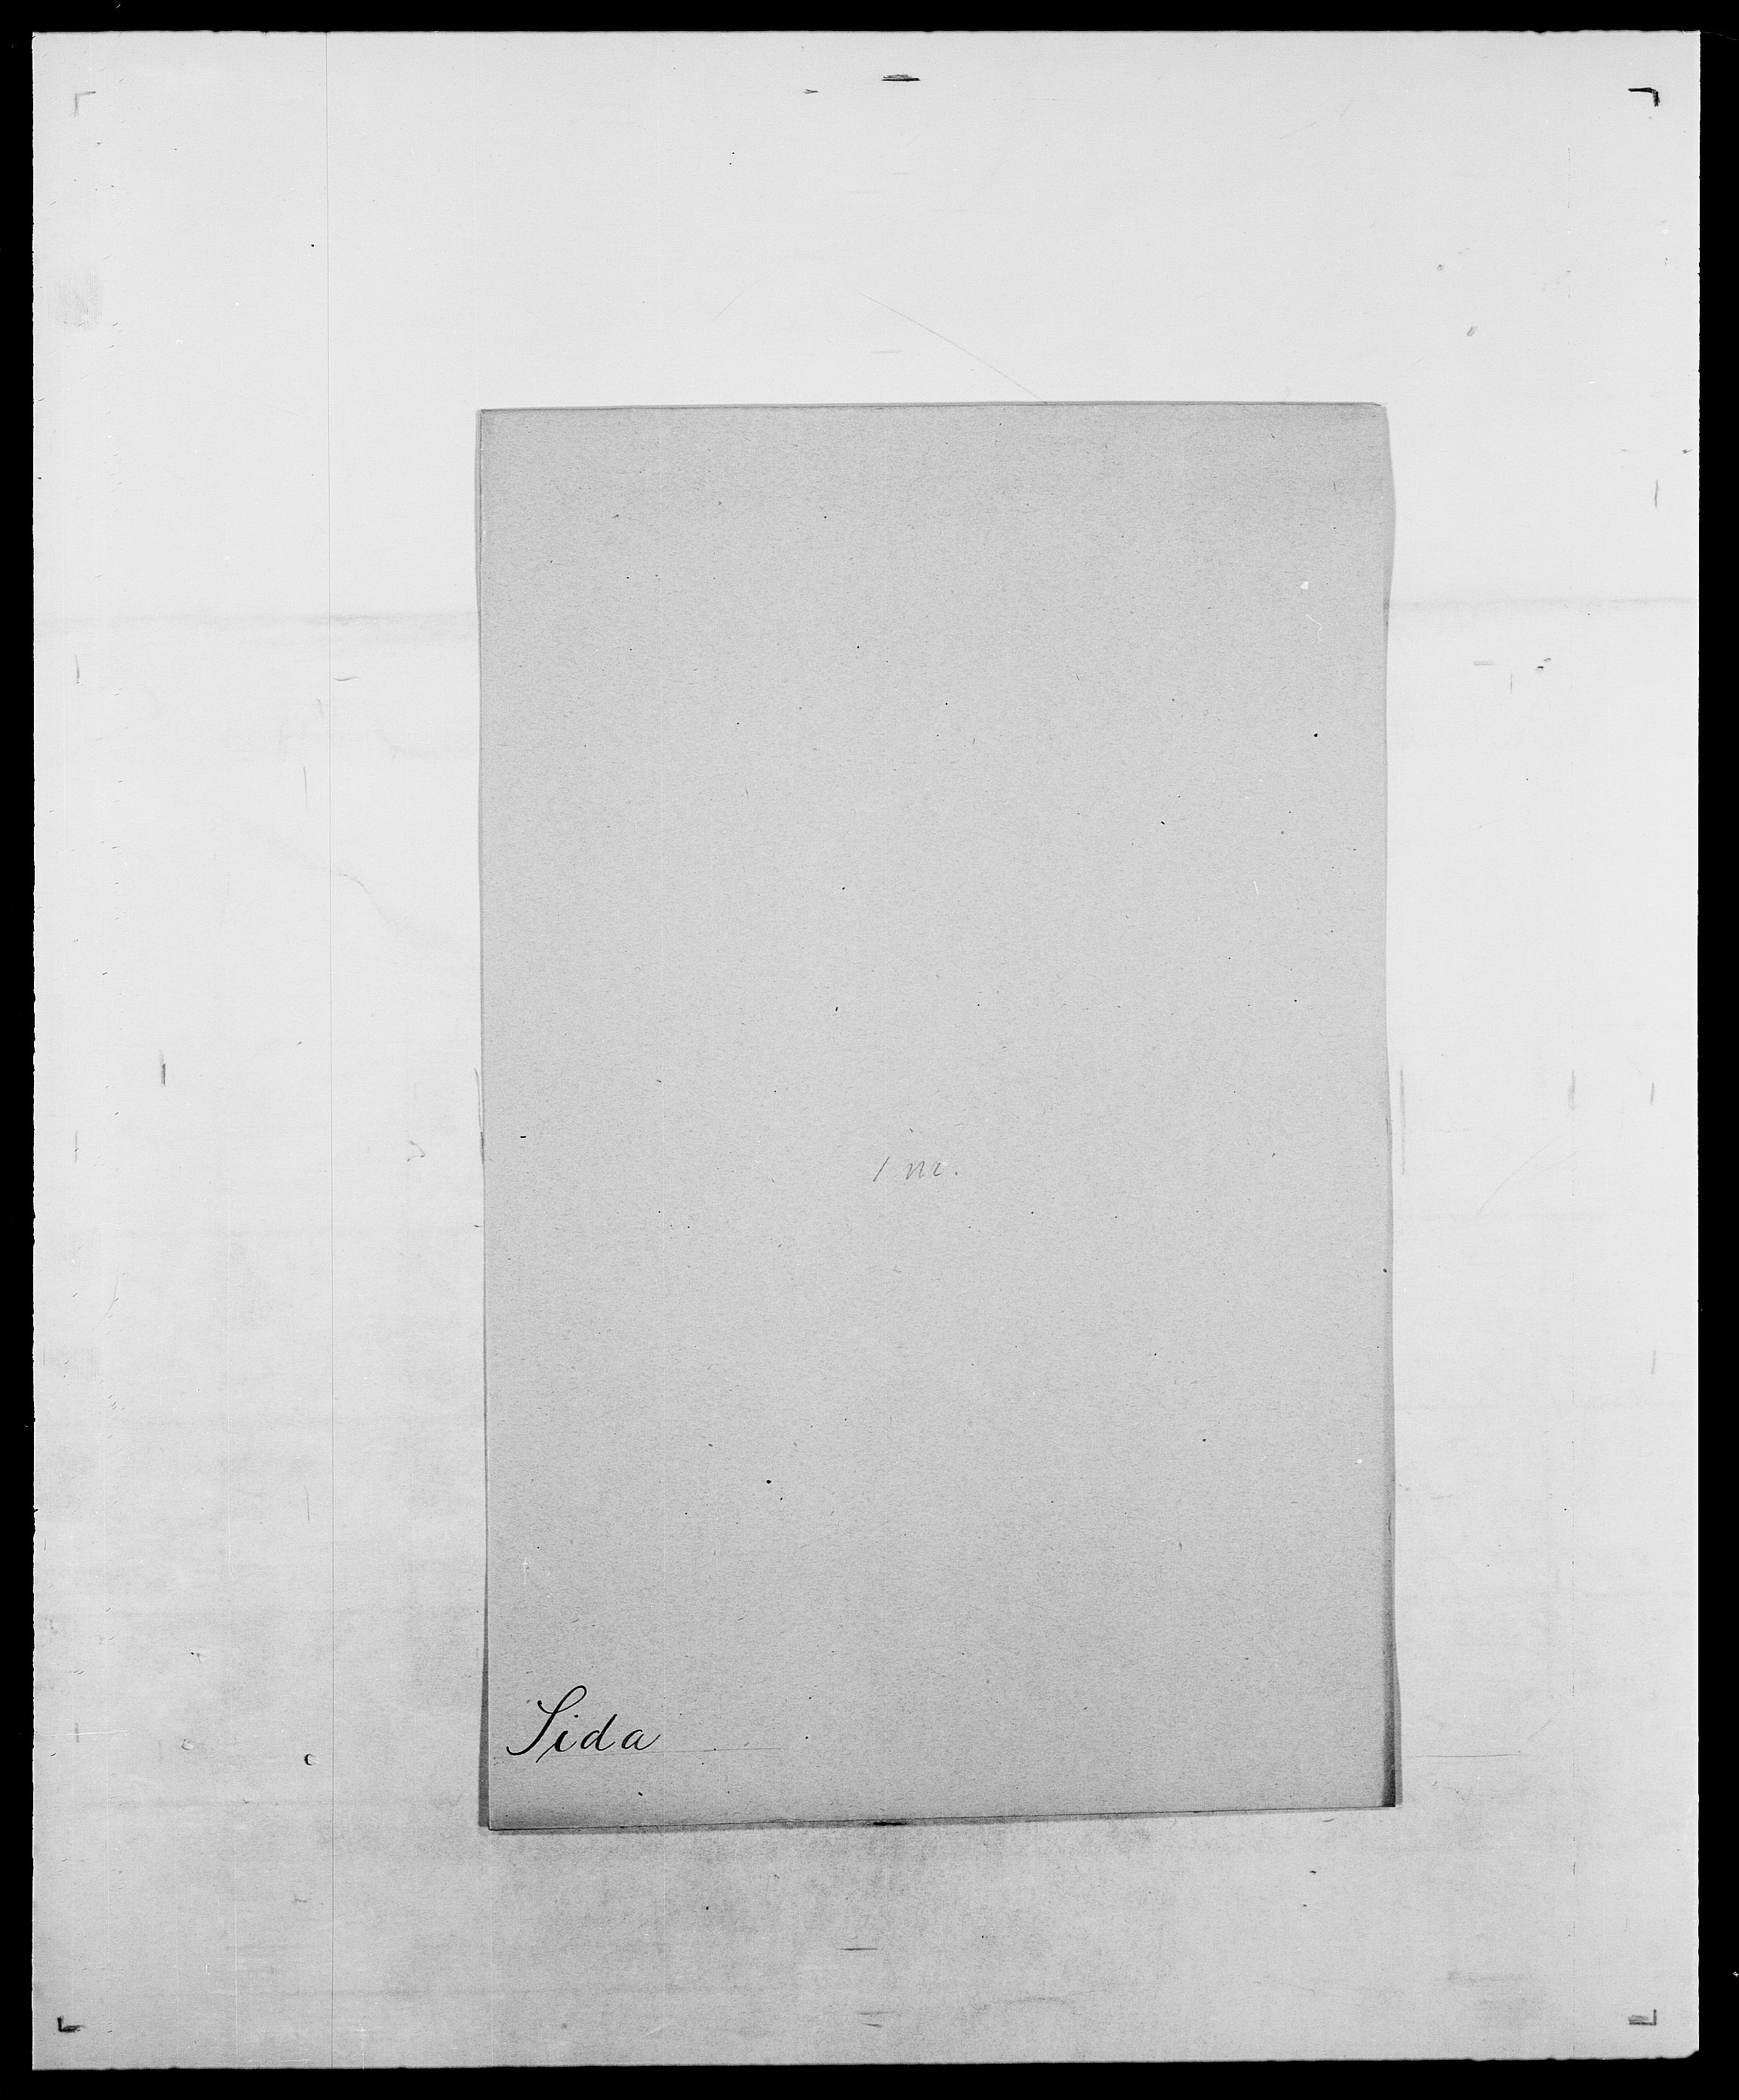 SAO, Delgobe, Charles Antoine - samling, D/Da/L0035: Schnabel - sjetman, s. 755